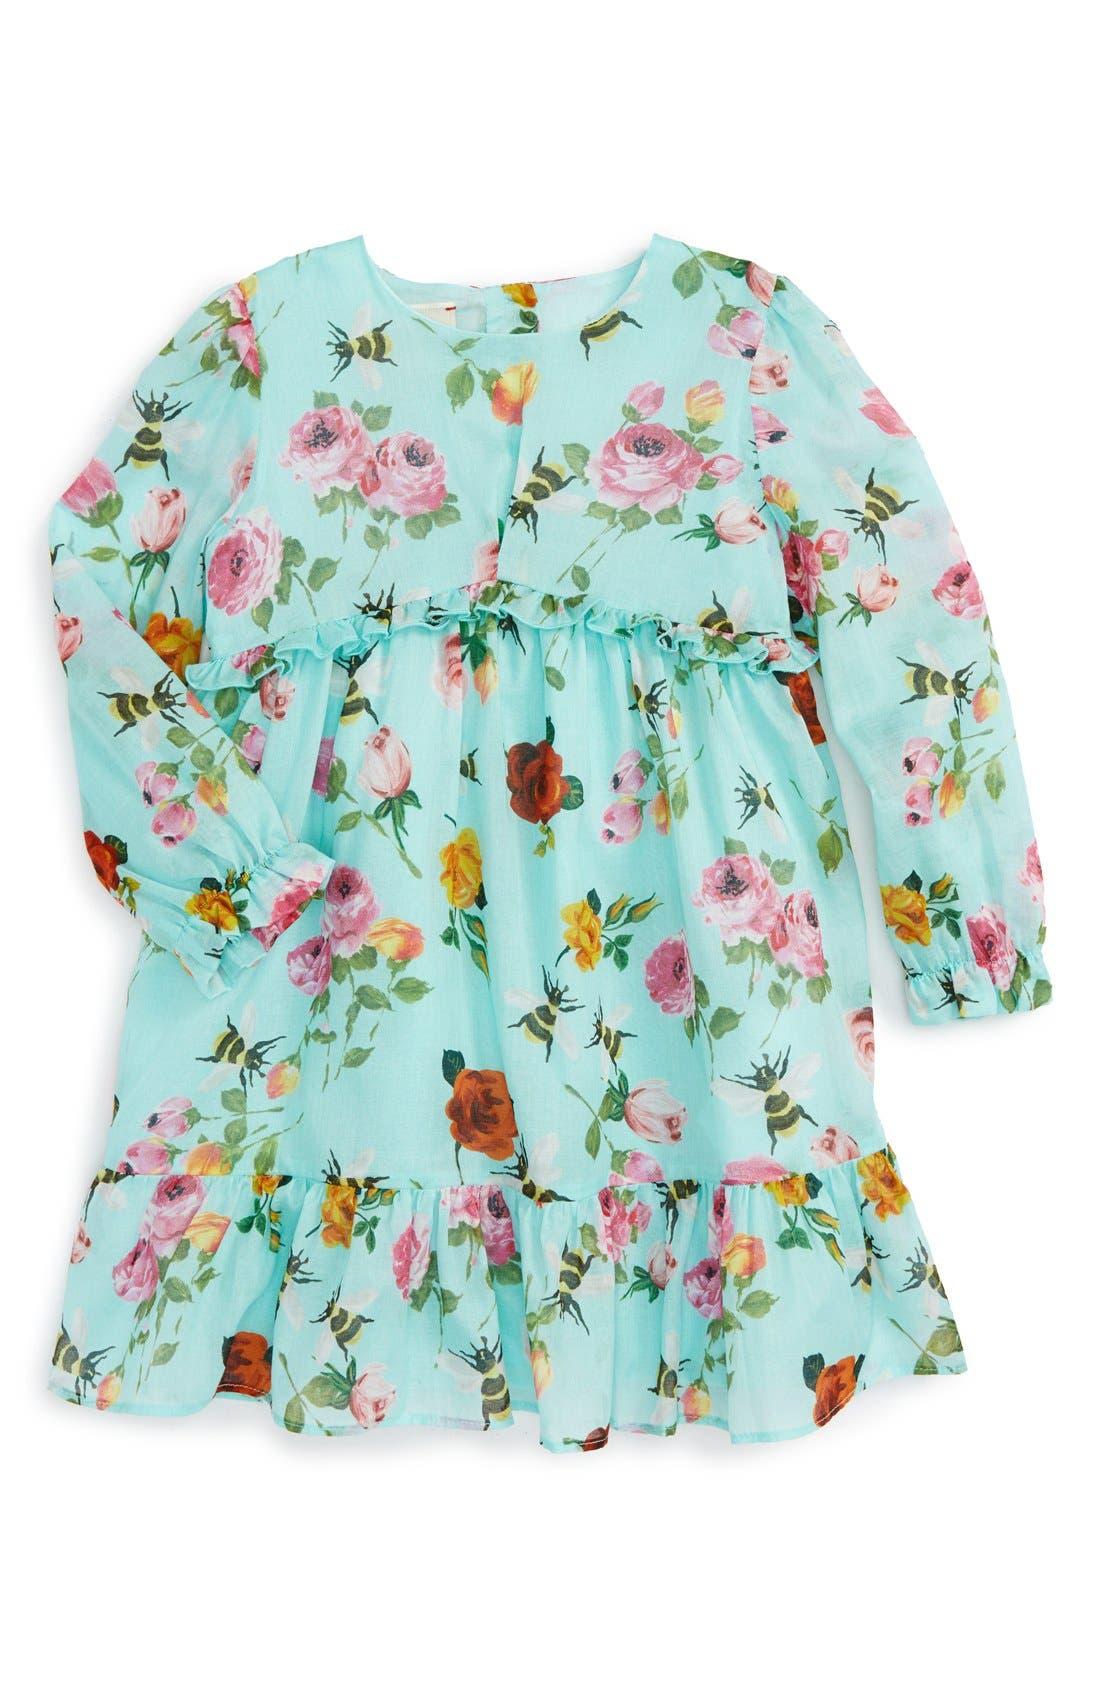 GUCCI Floral Print Long Sleeve Dress